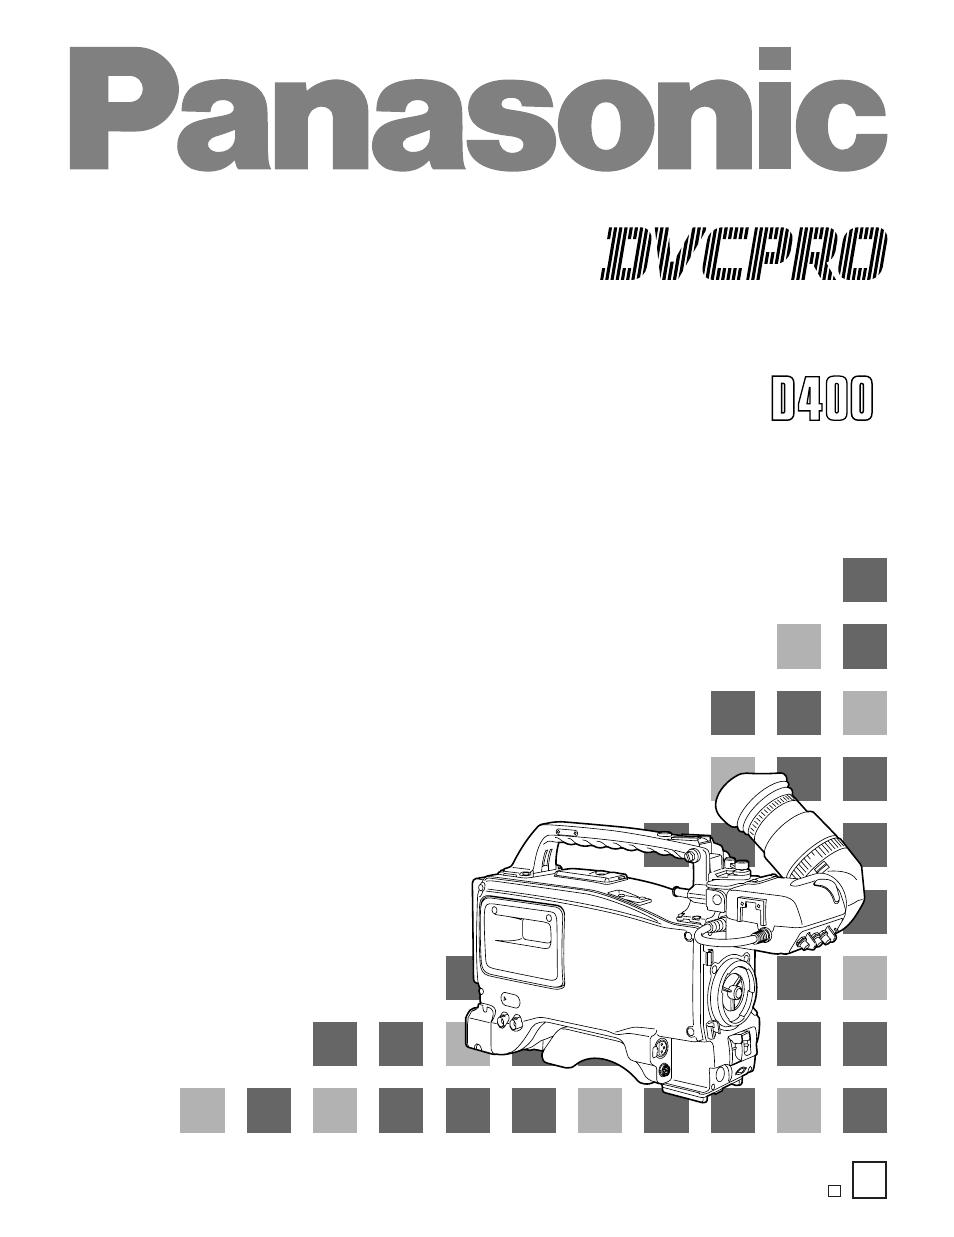 Panasonic Aj D400 User Manual 128 Pages